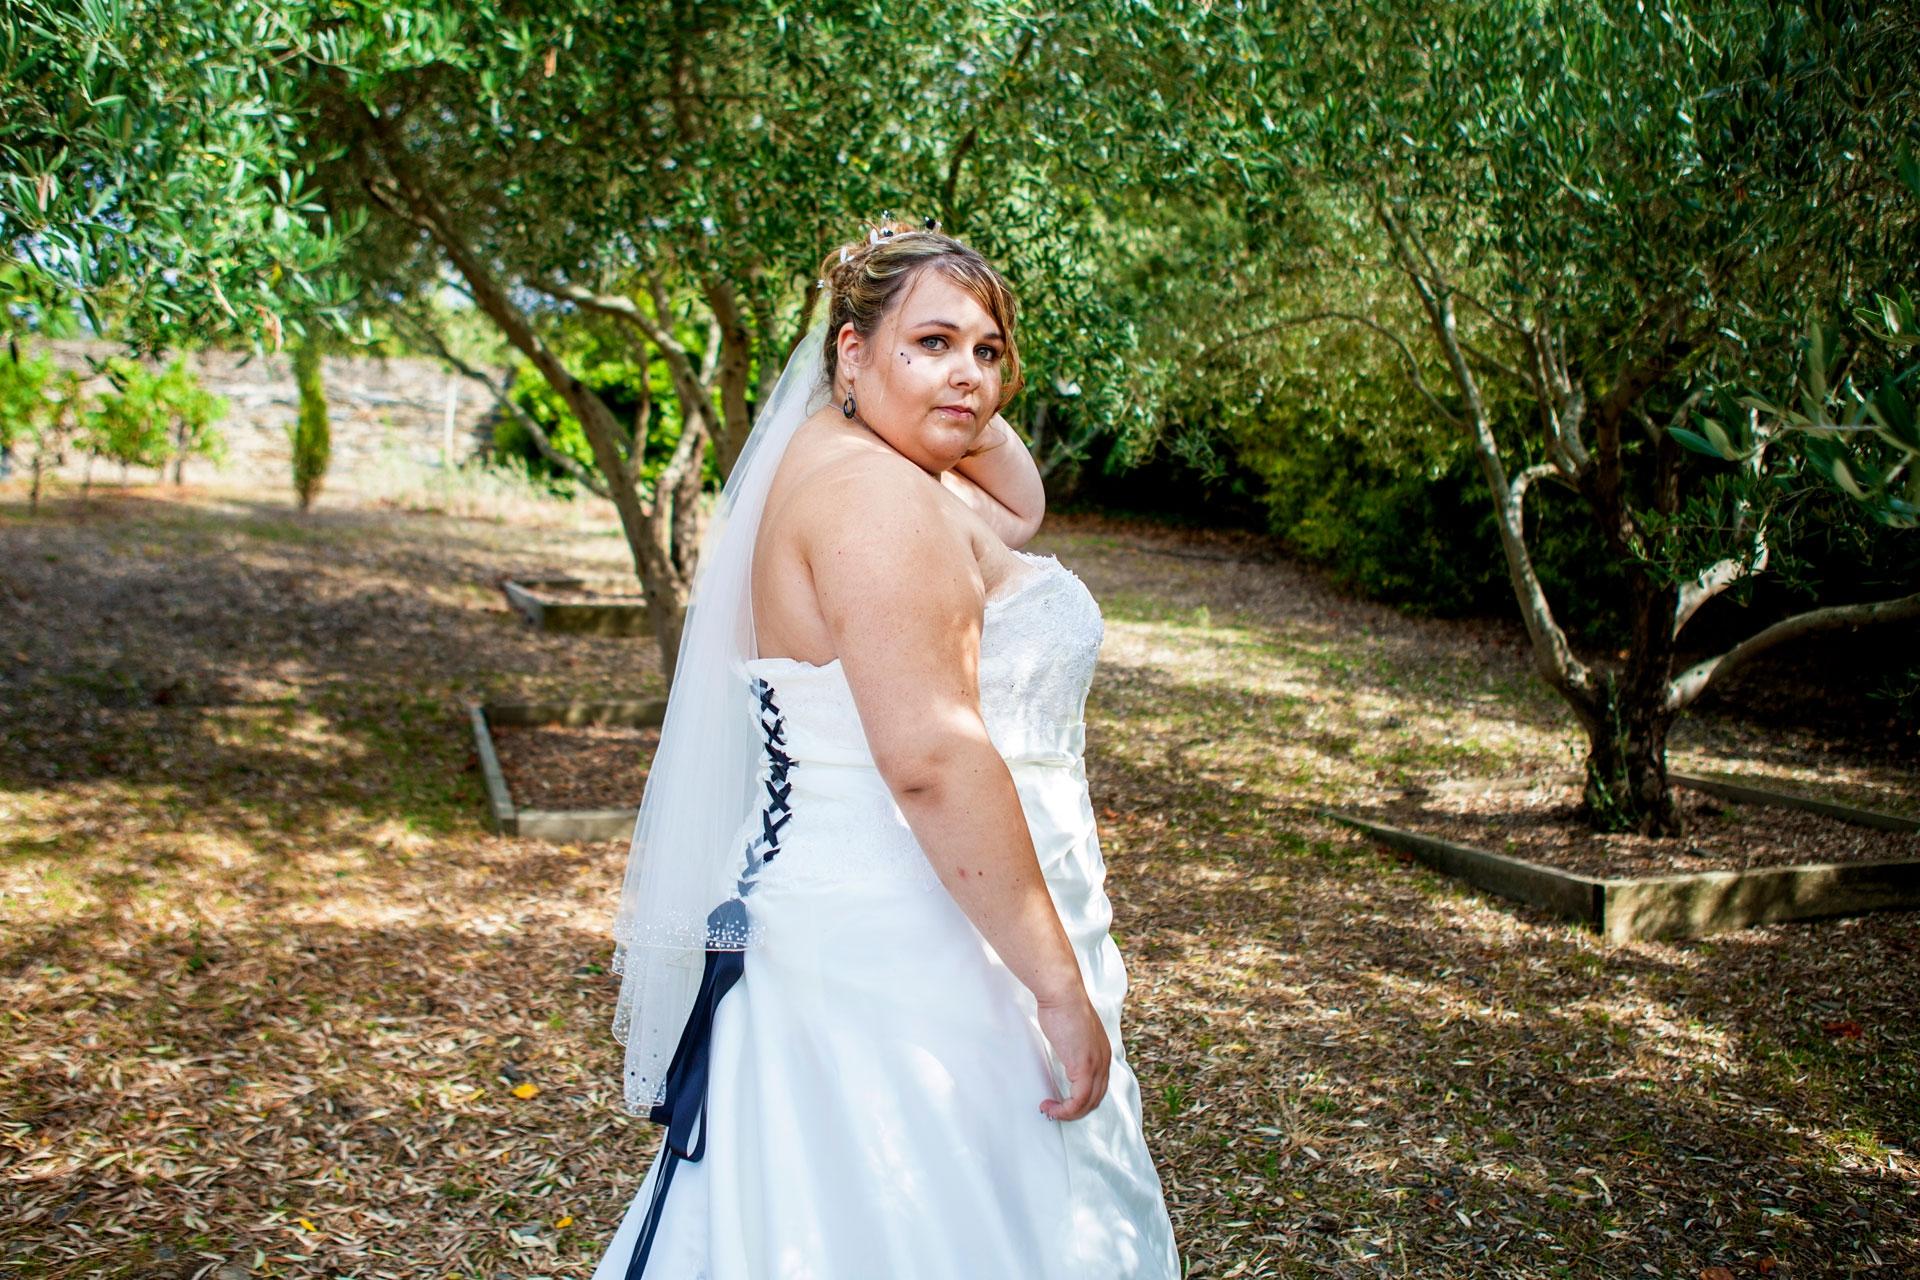 mariage-elodie-wilson-21